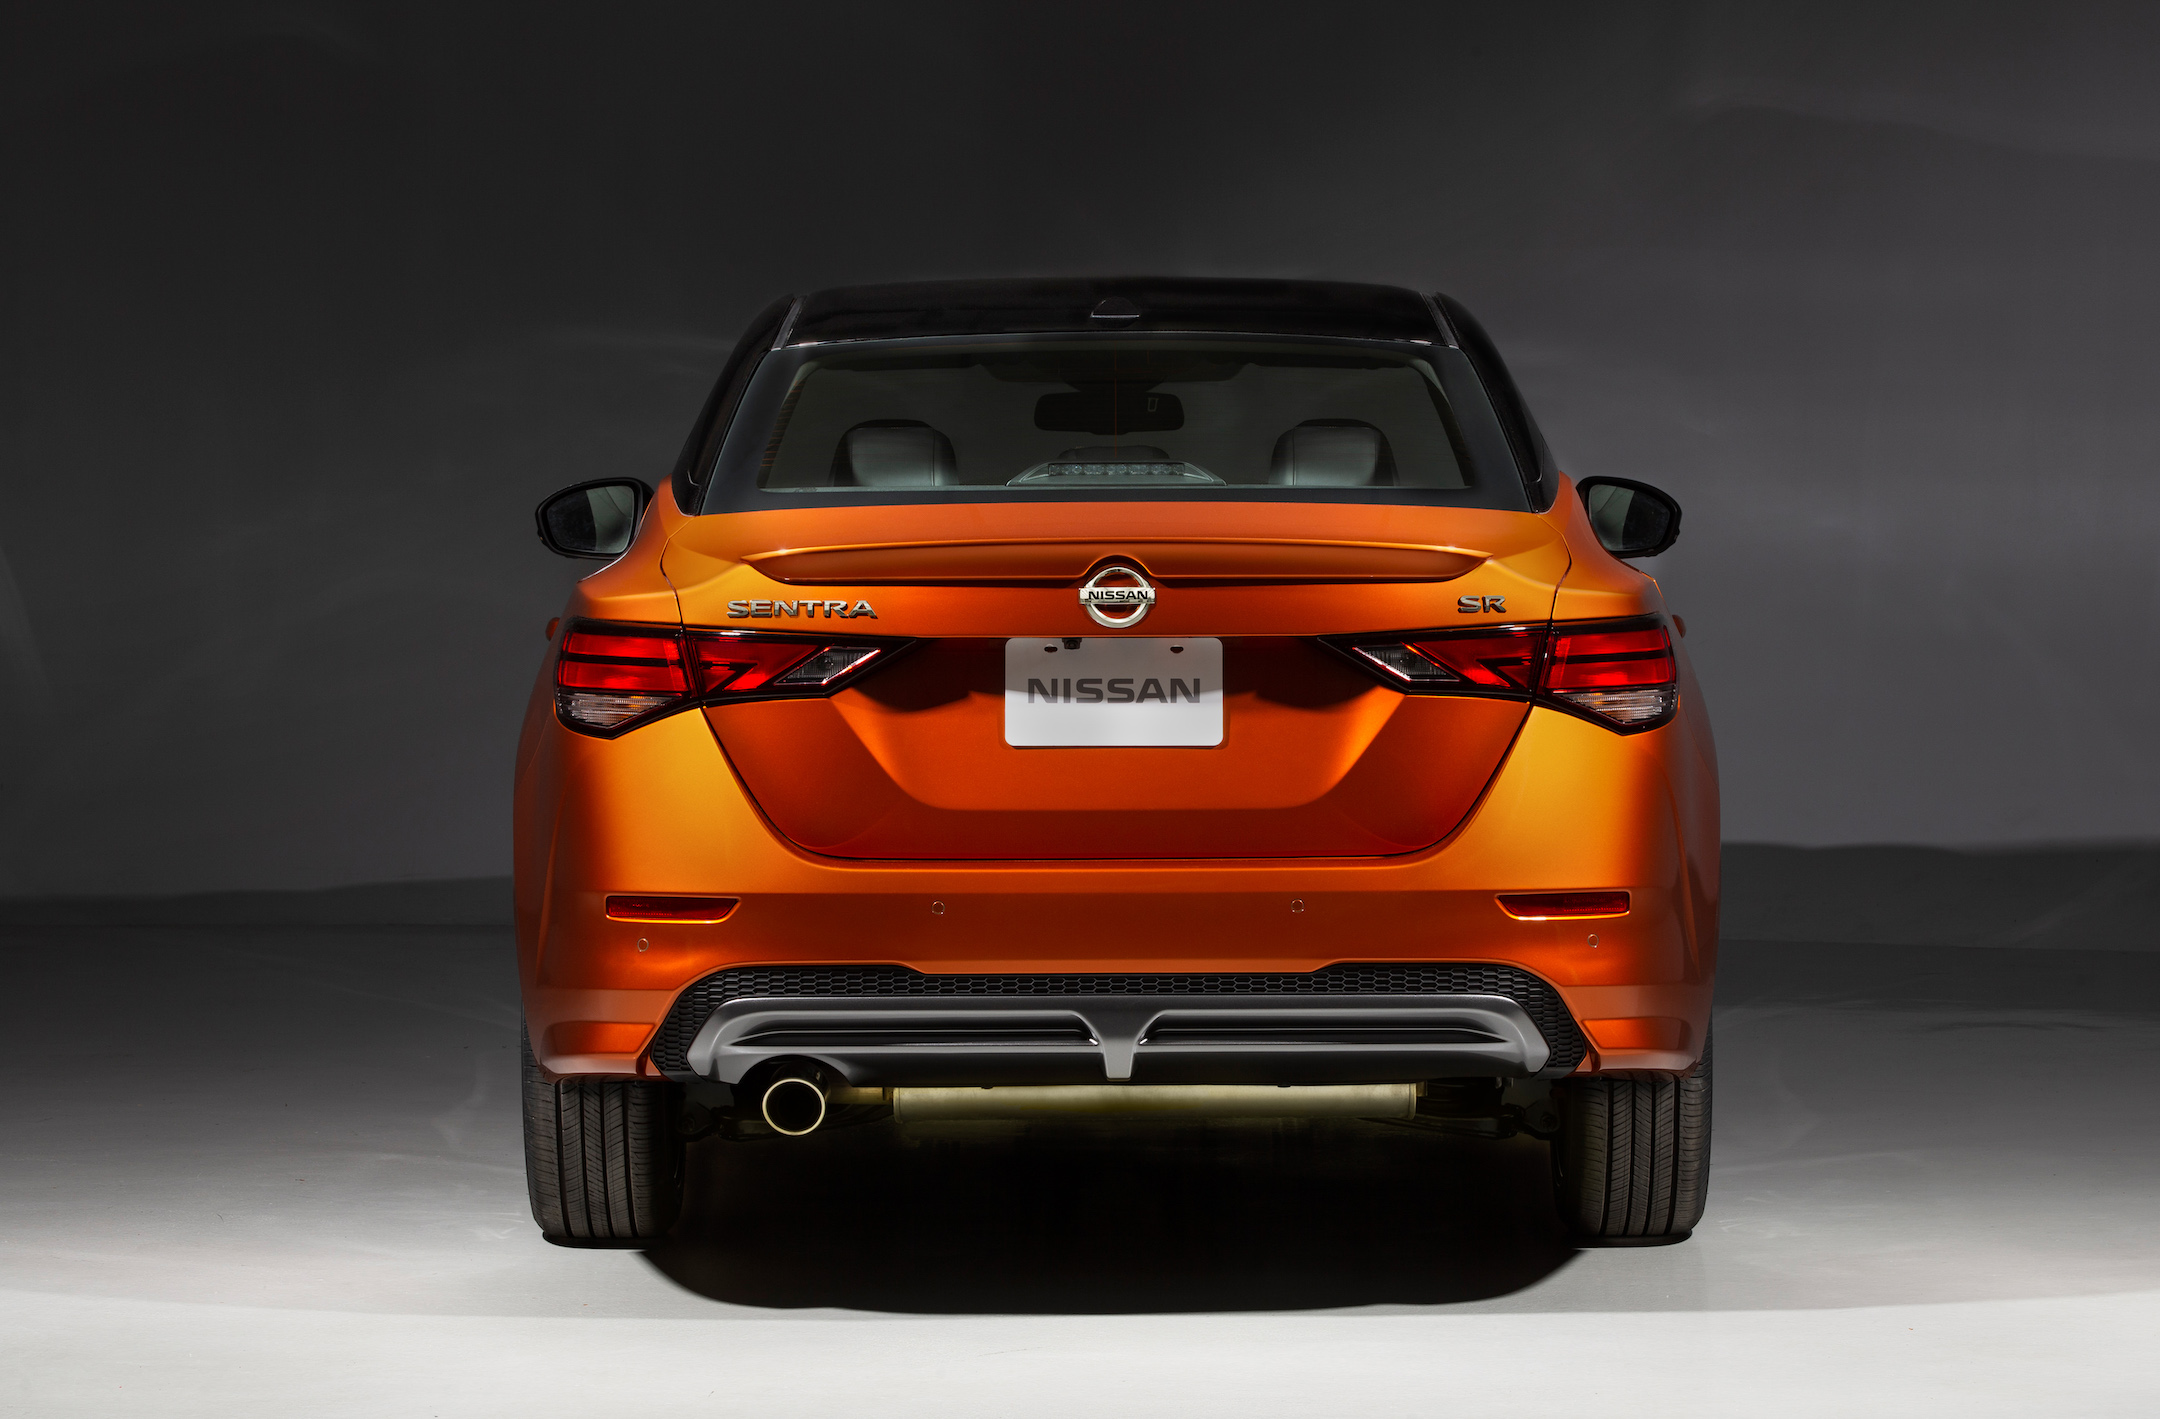 2020 Nissan Sentra_O-13-source